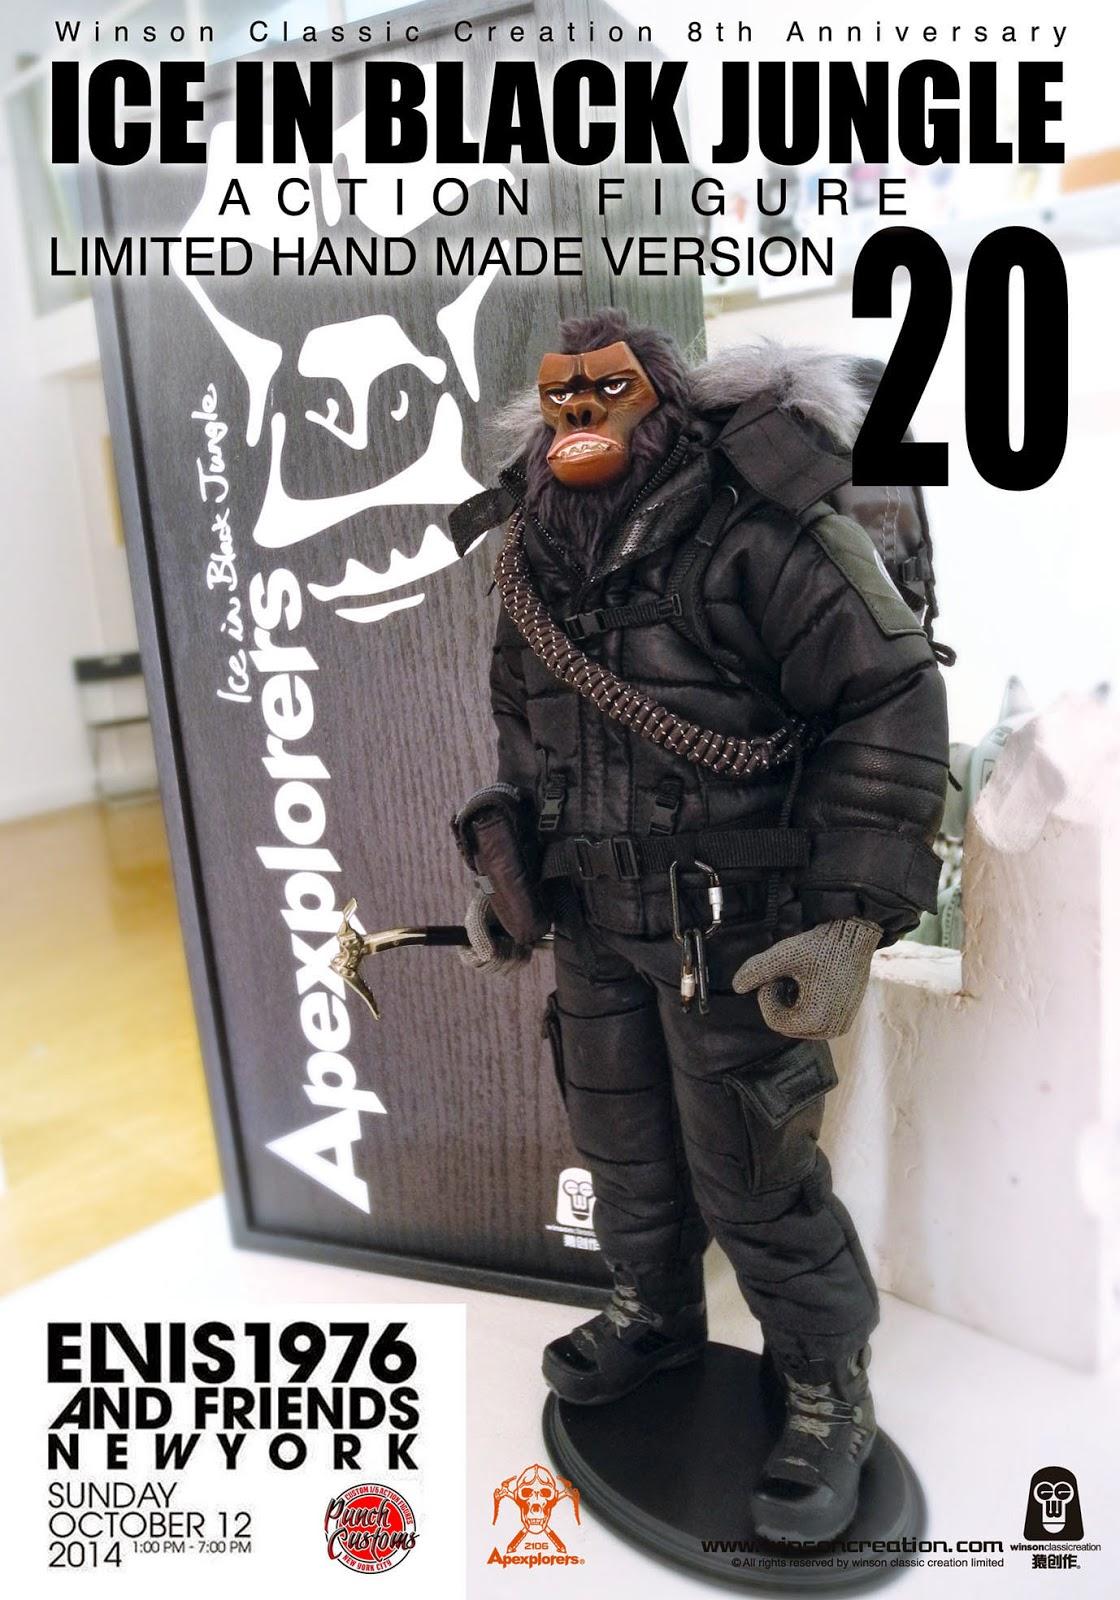 Punch Customs Presents Elvis1976 Amp Friends Custom Figure